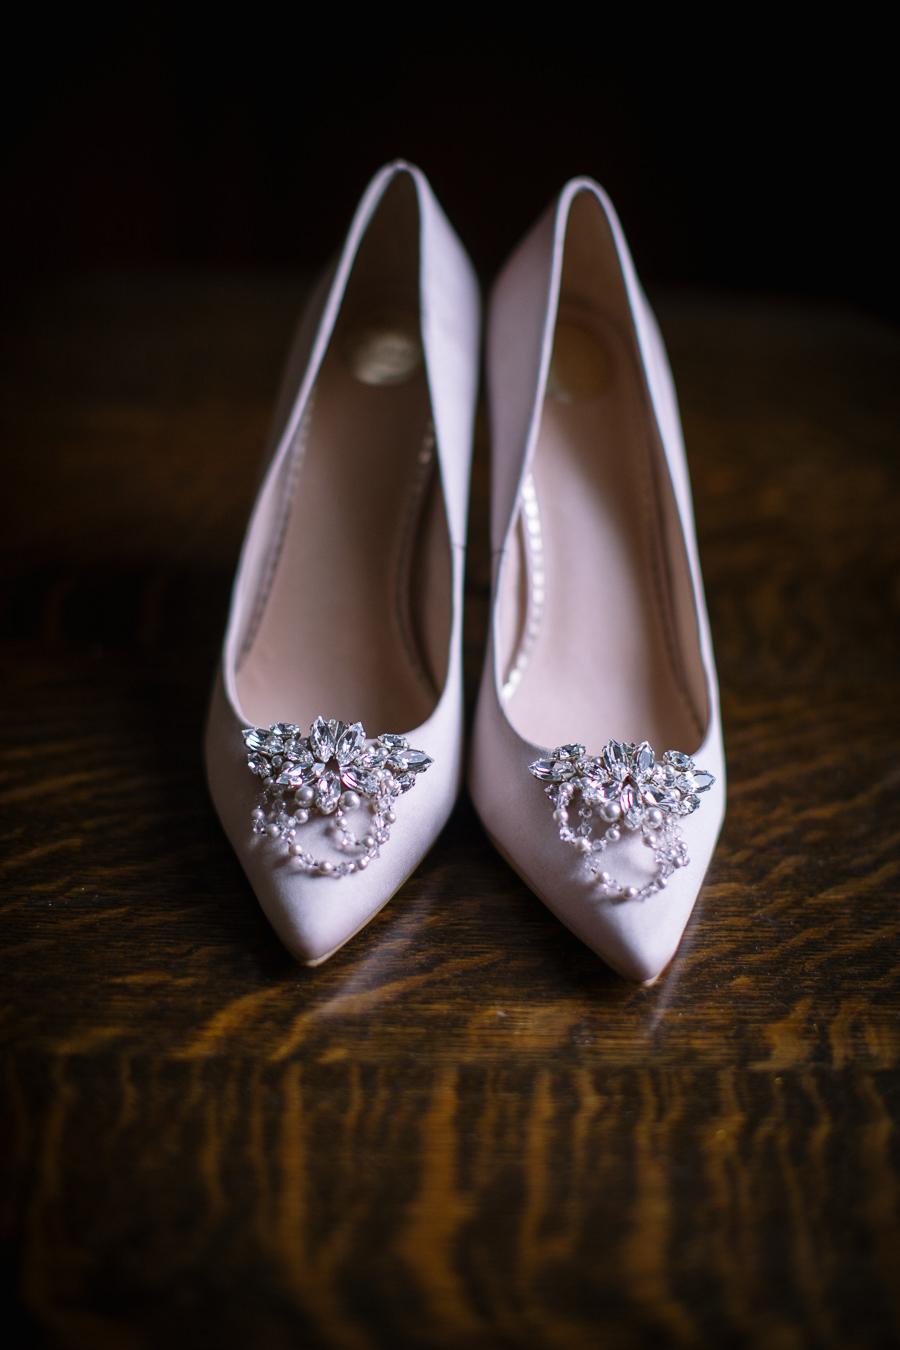 'Understated Elegance' Spring Styled Hampshire Bridal Shoot – Rownhams House, photo credit Nisha Haq Photography (25)